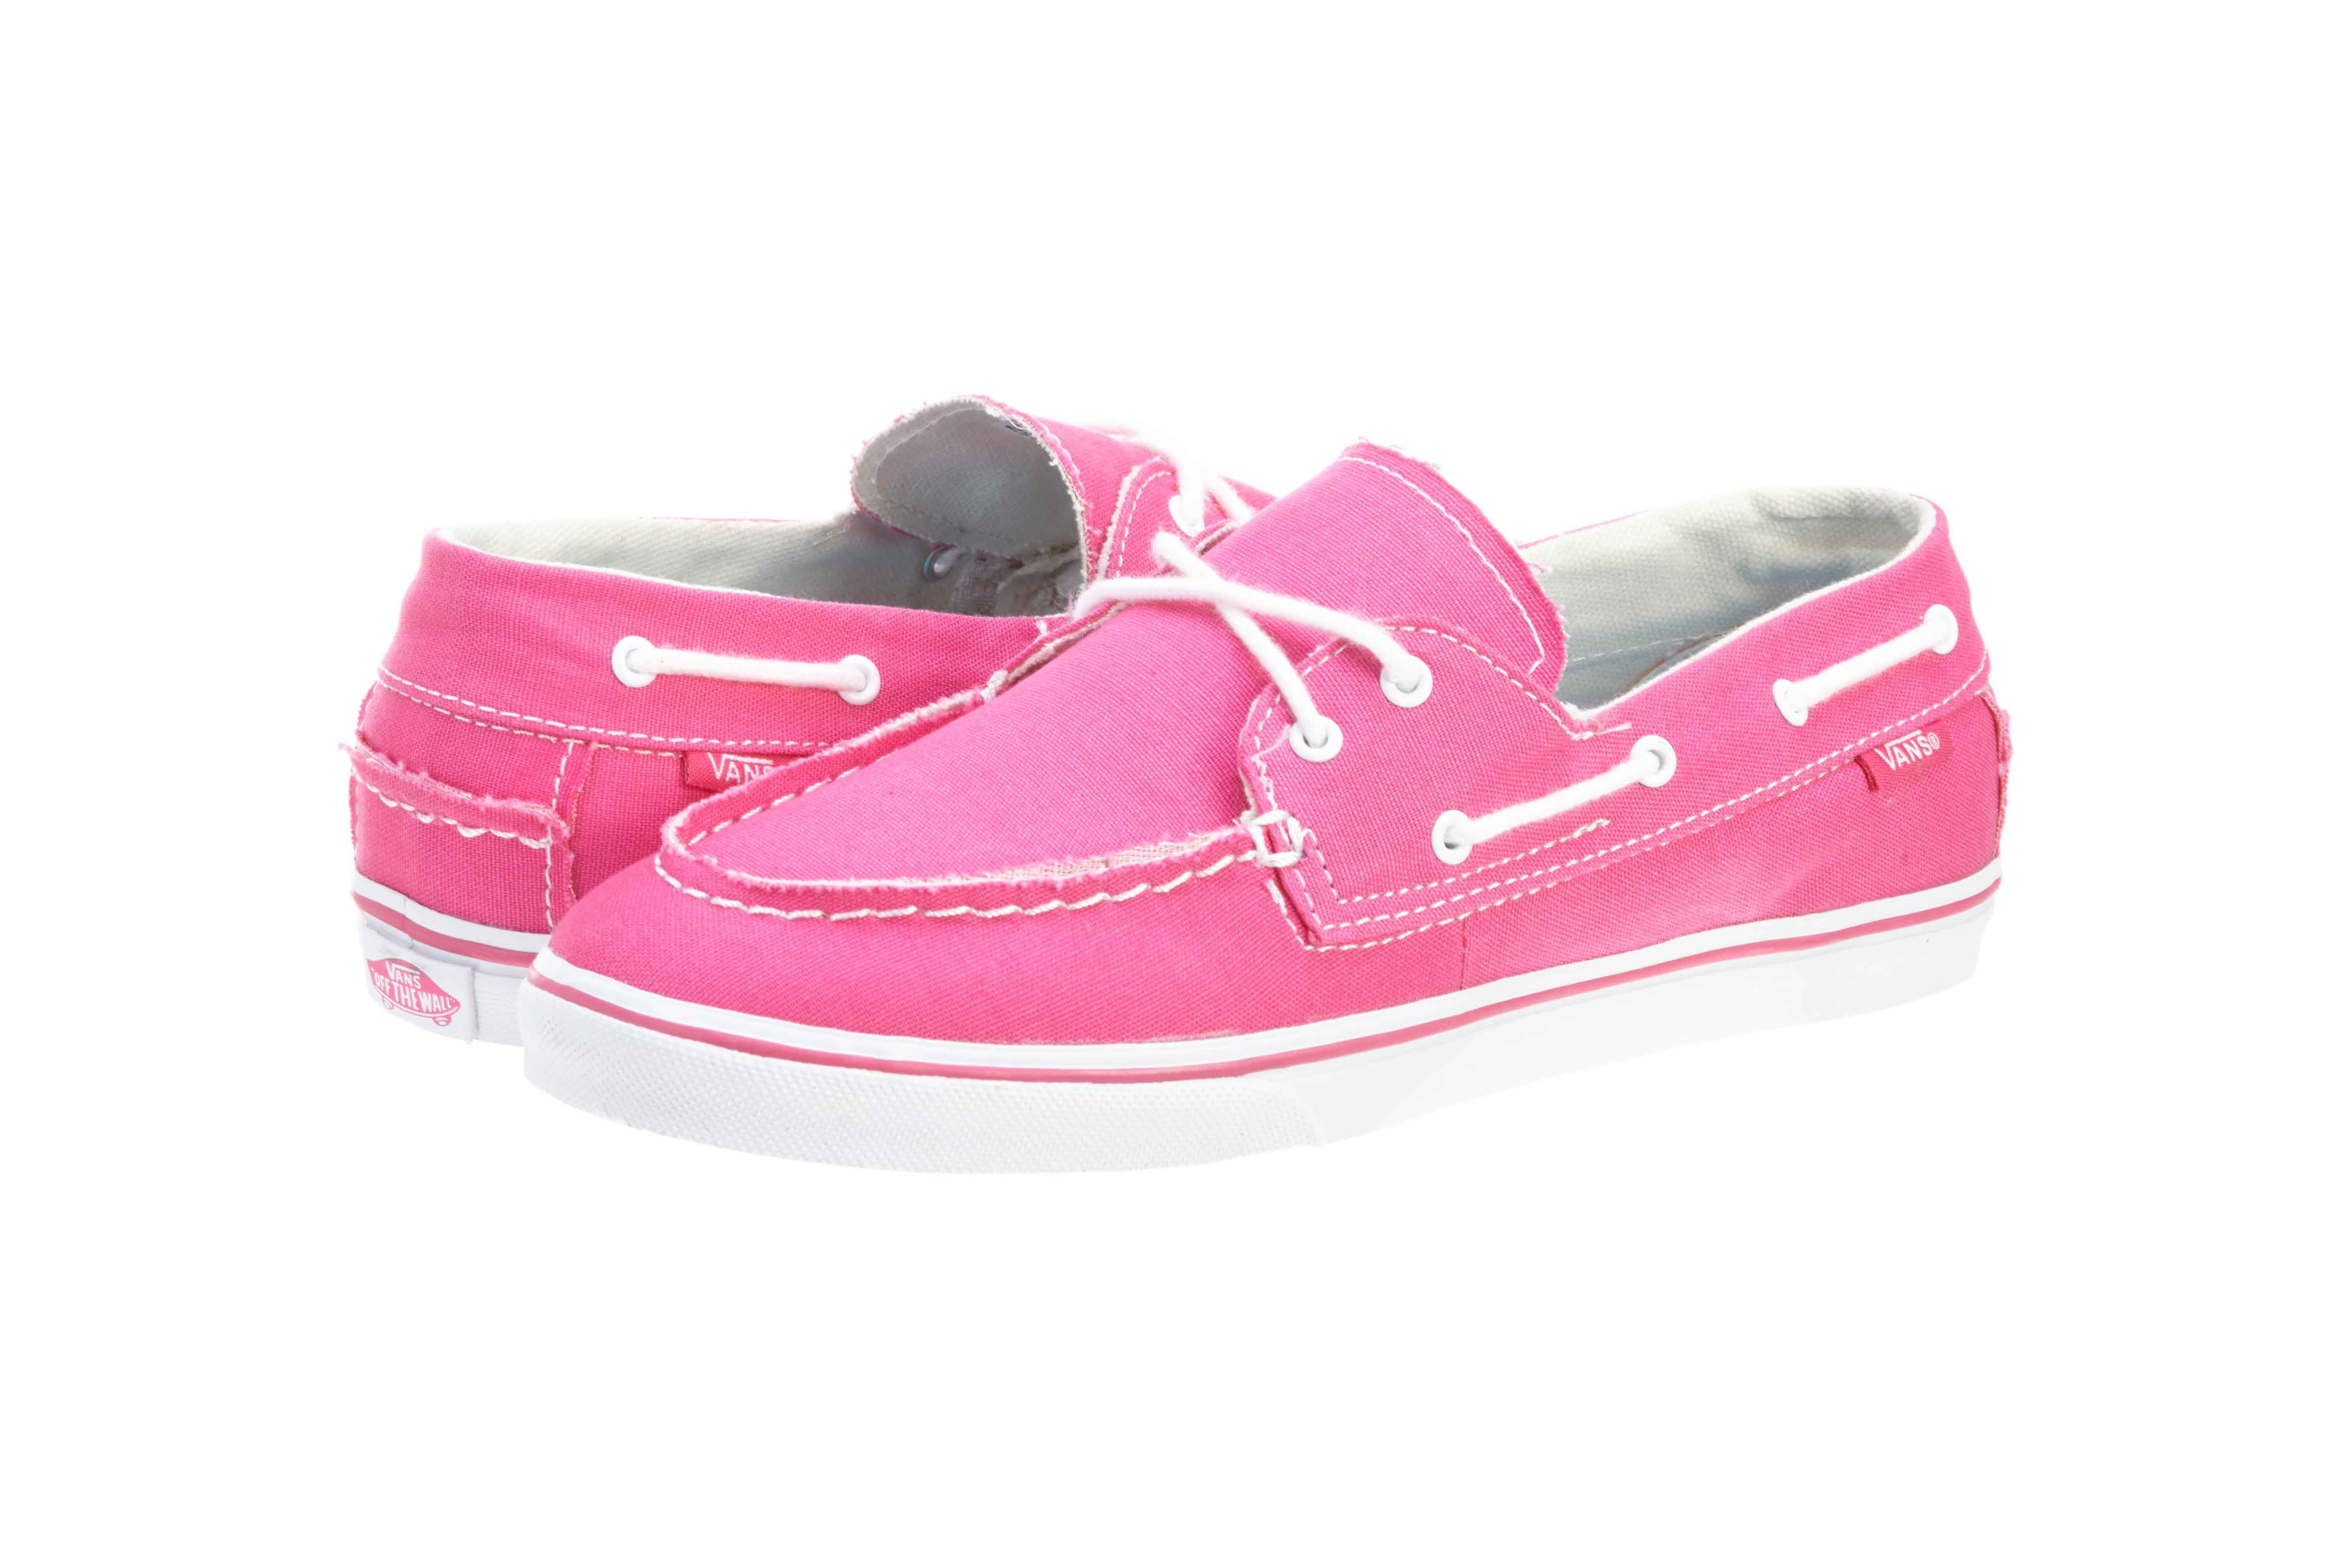 Vans Zapato Lo Pro Unisex Style # Vn-0Nlk by